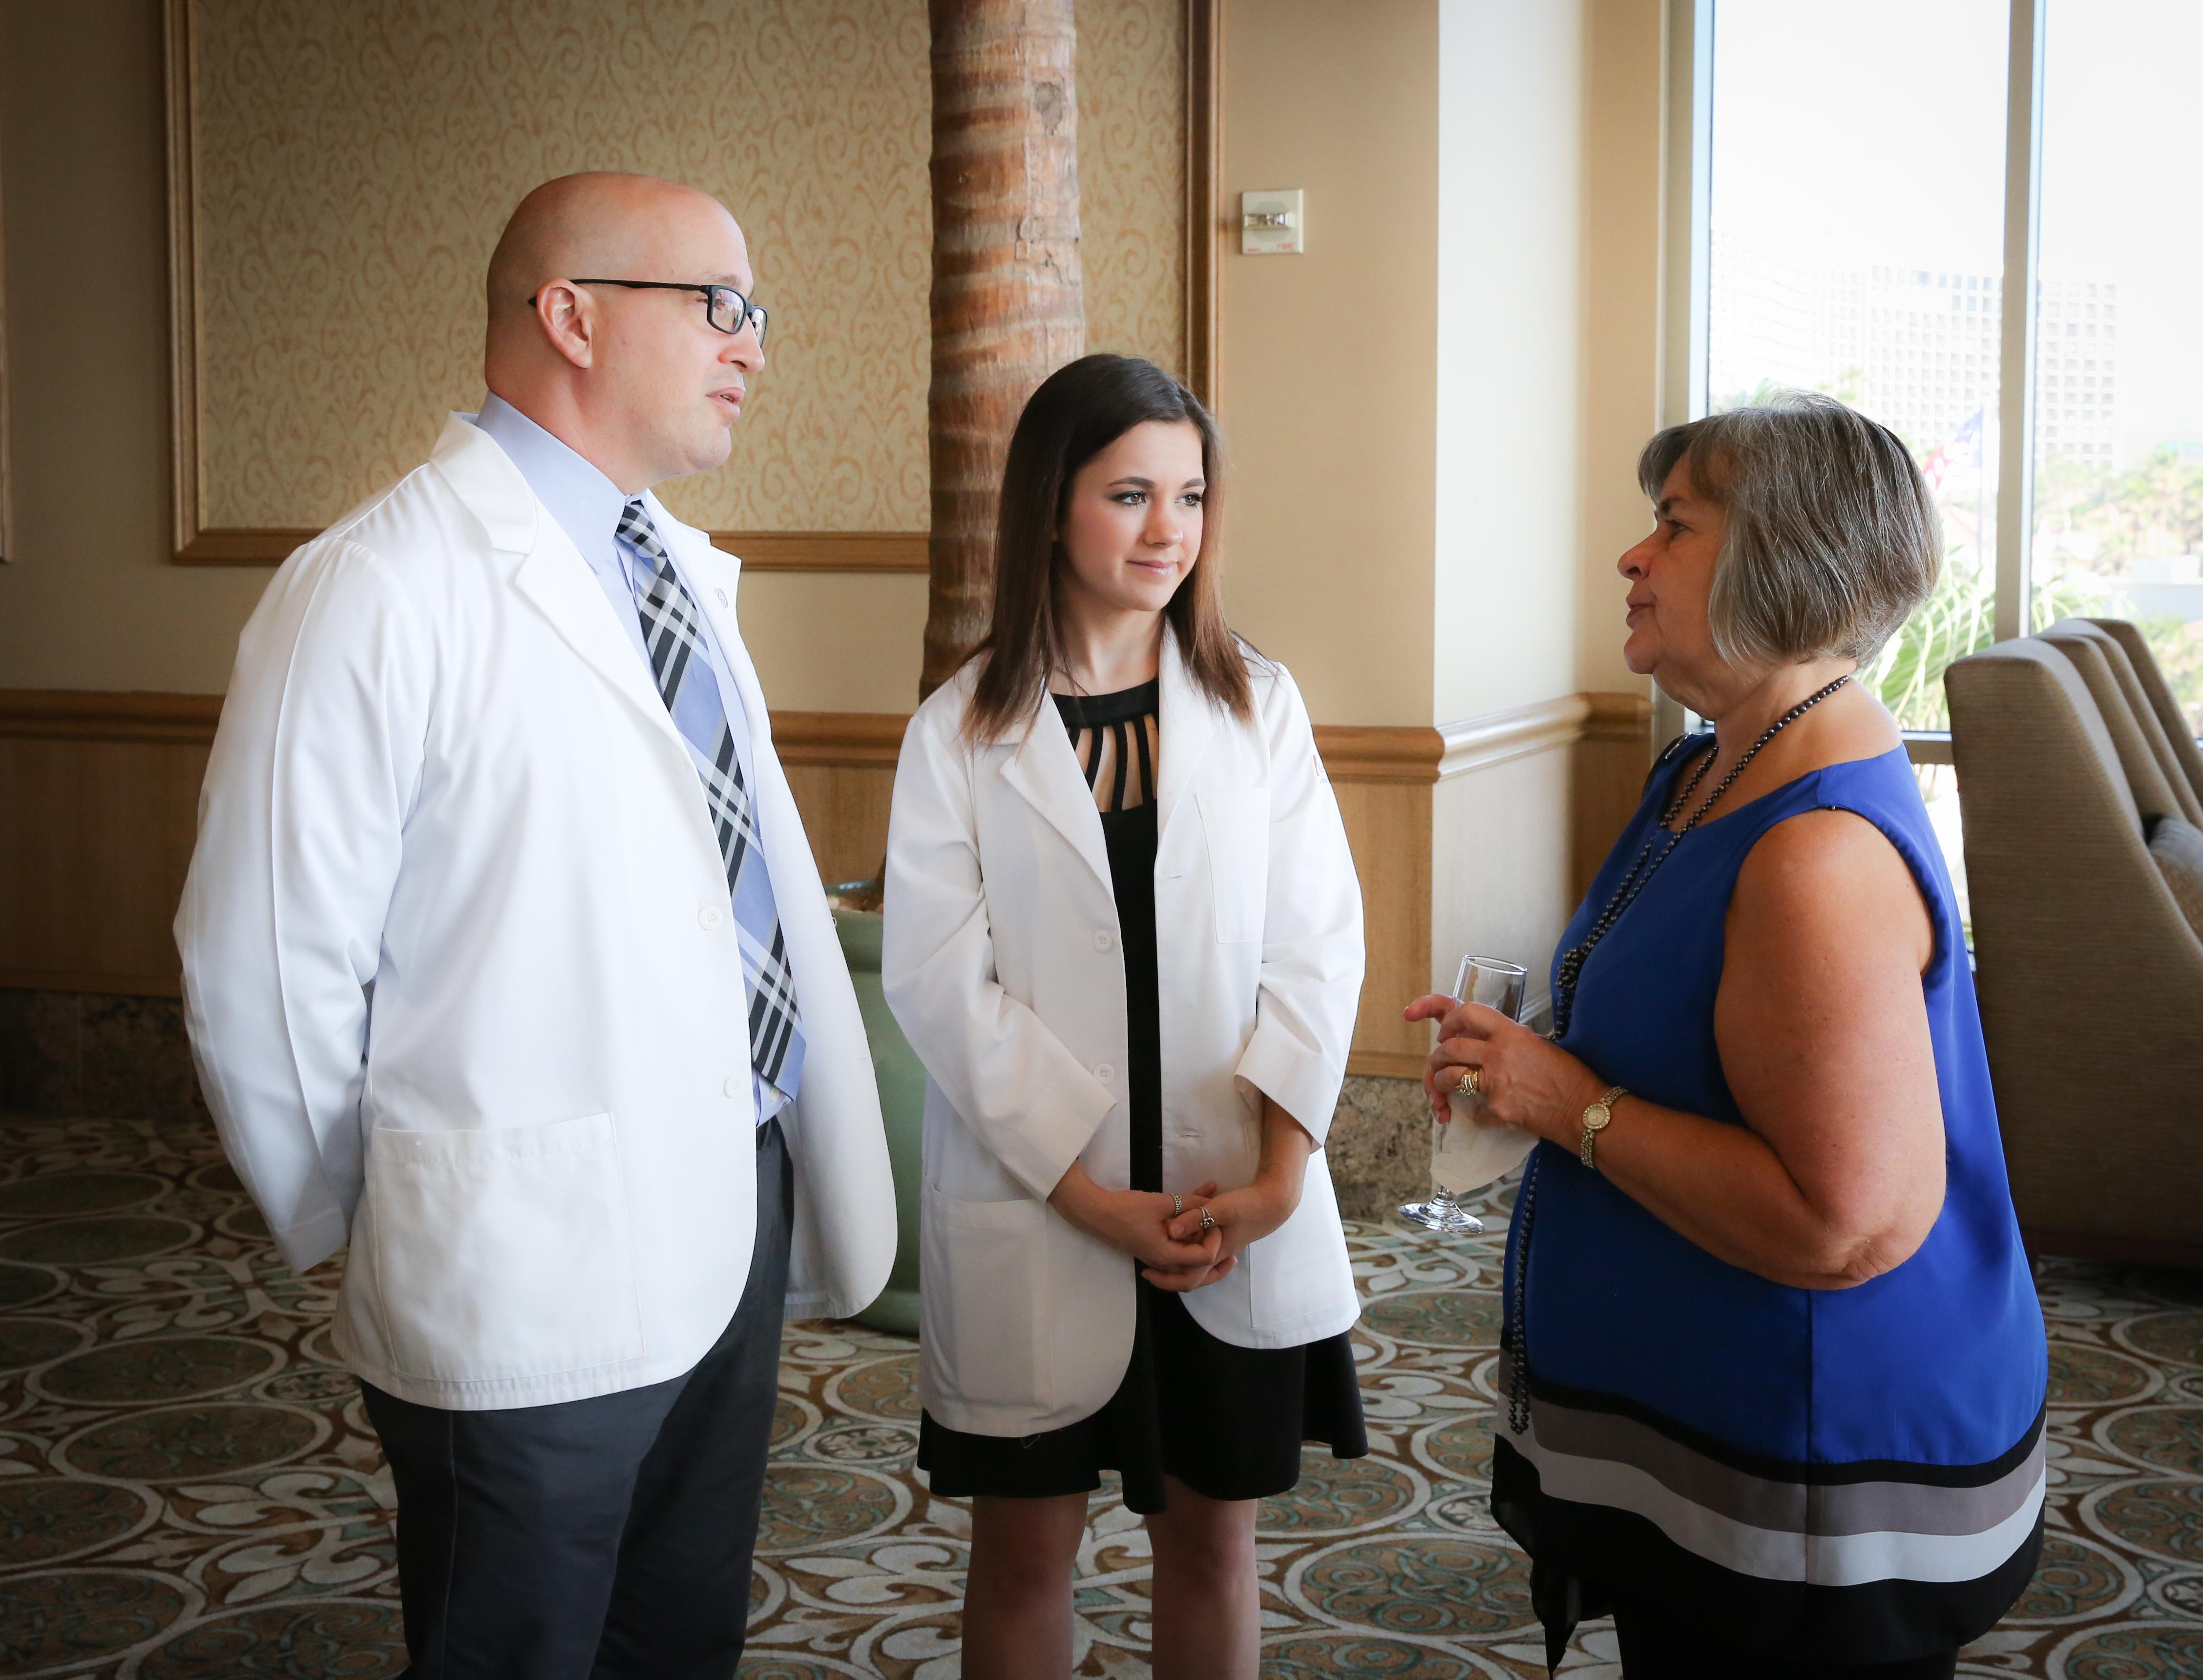 Honors Program Students | Image 4 | UTMB School of Nursing